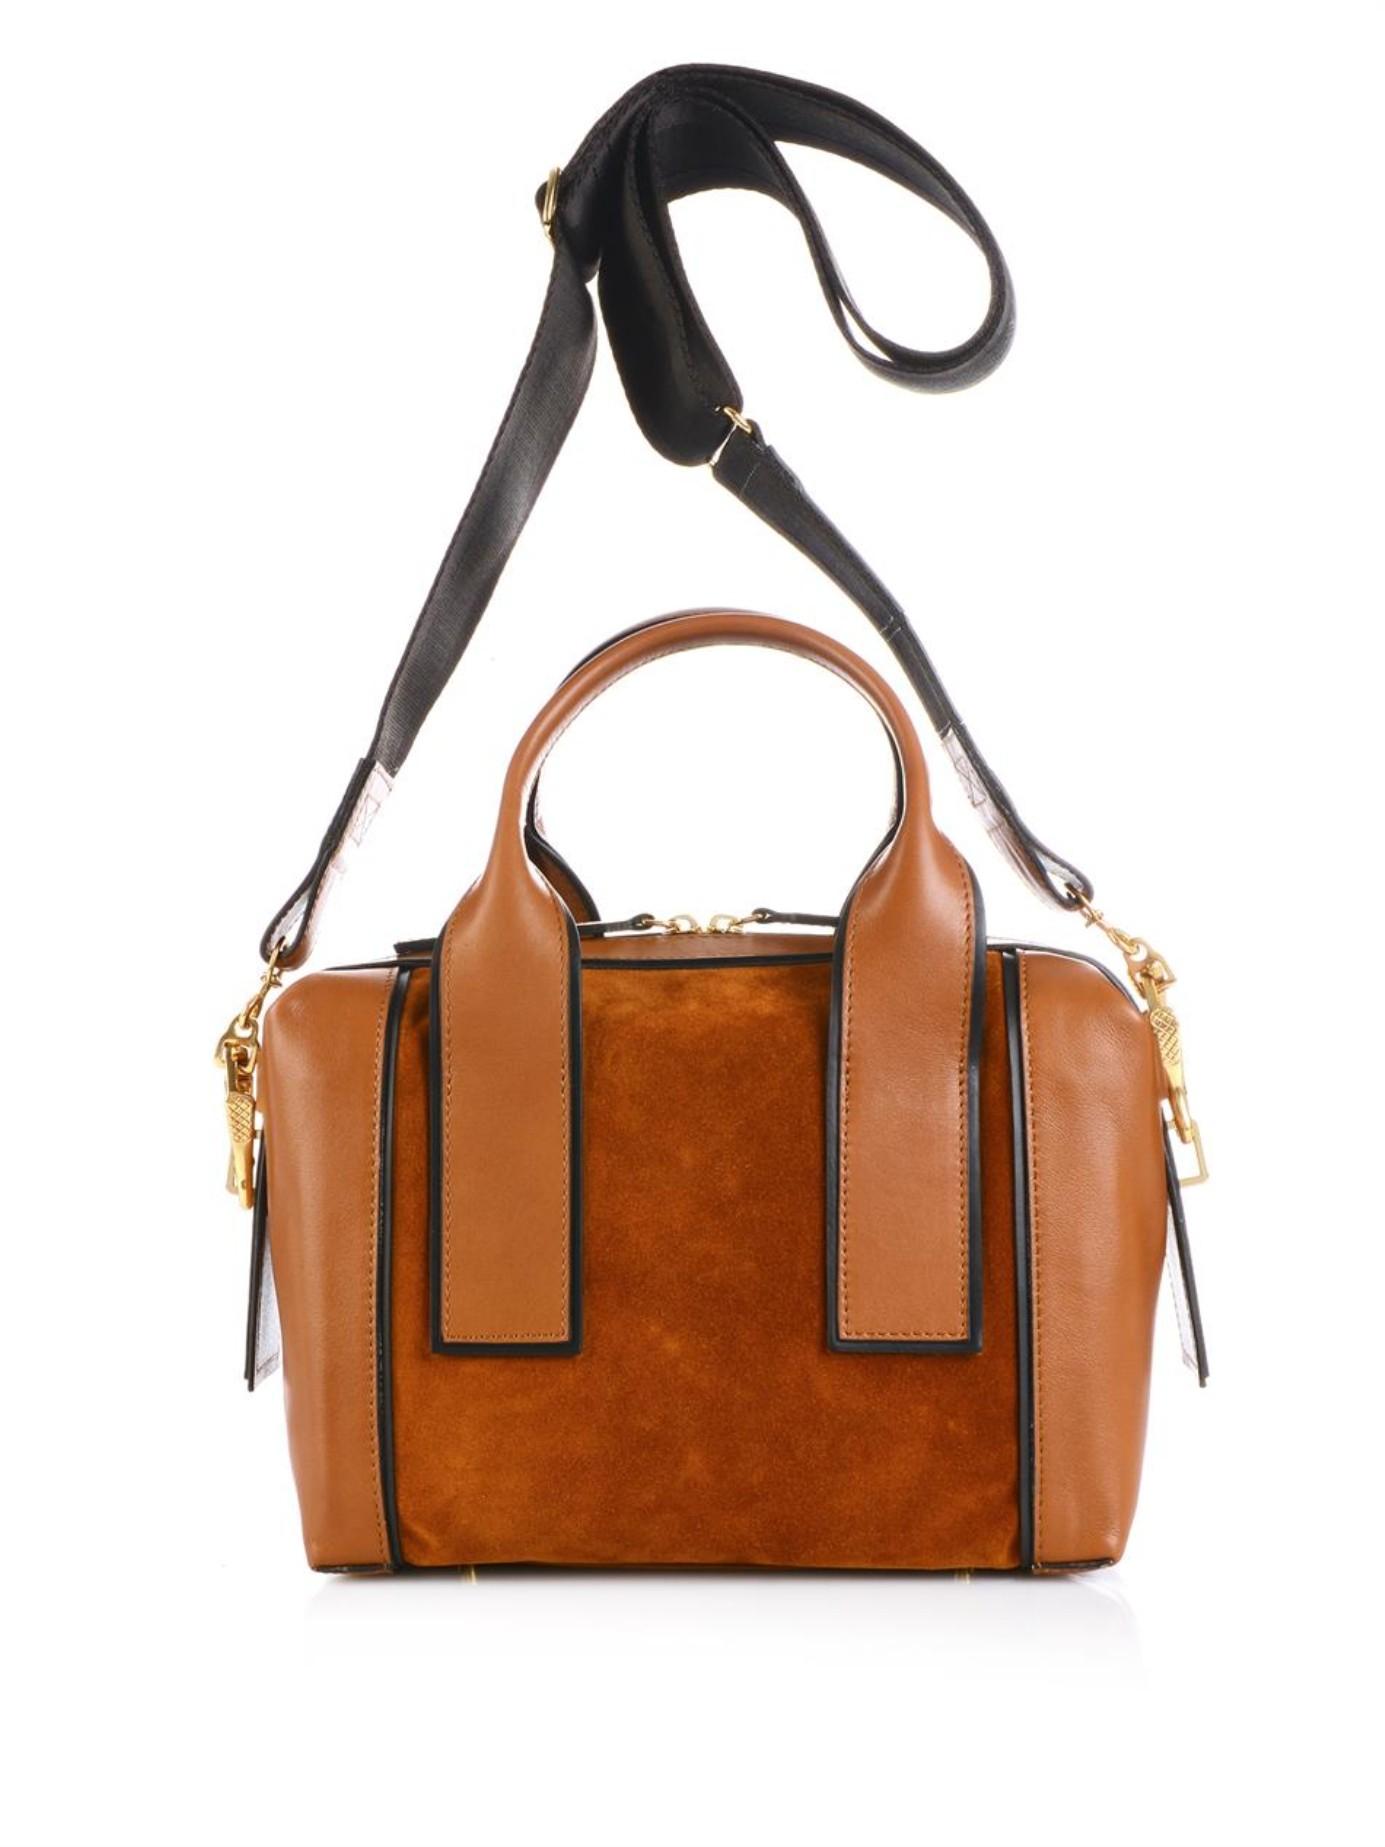 Pierre Hardy Leather Hand Bag Quality yWe1s